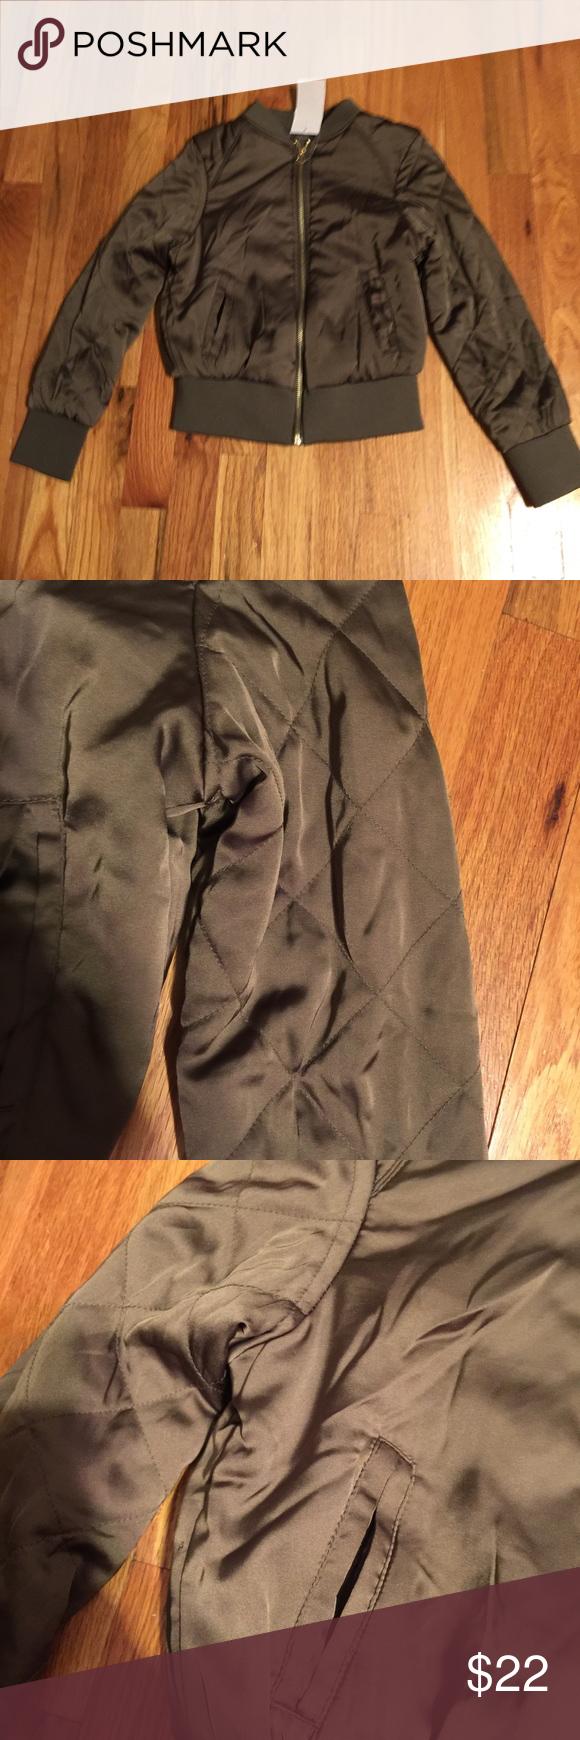 Army green satin jacket Brand new with tags Jackets & Coats